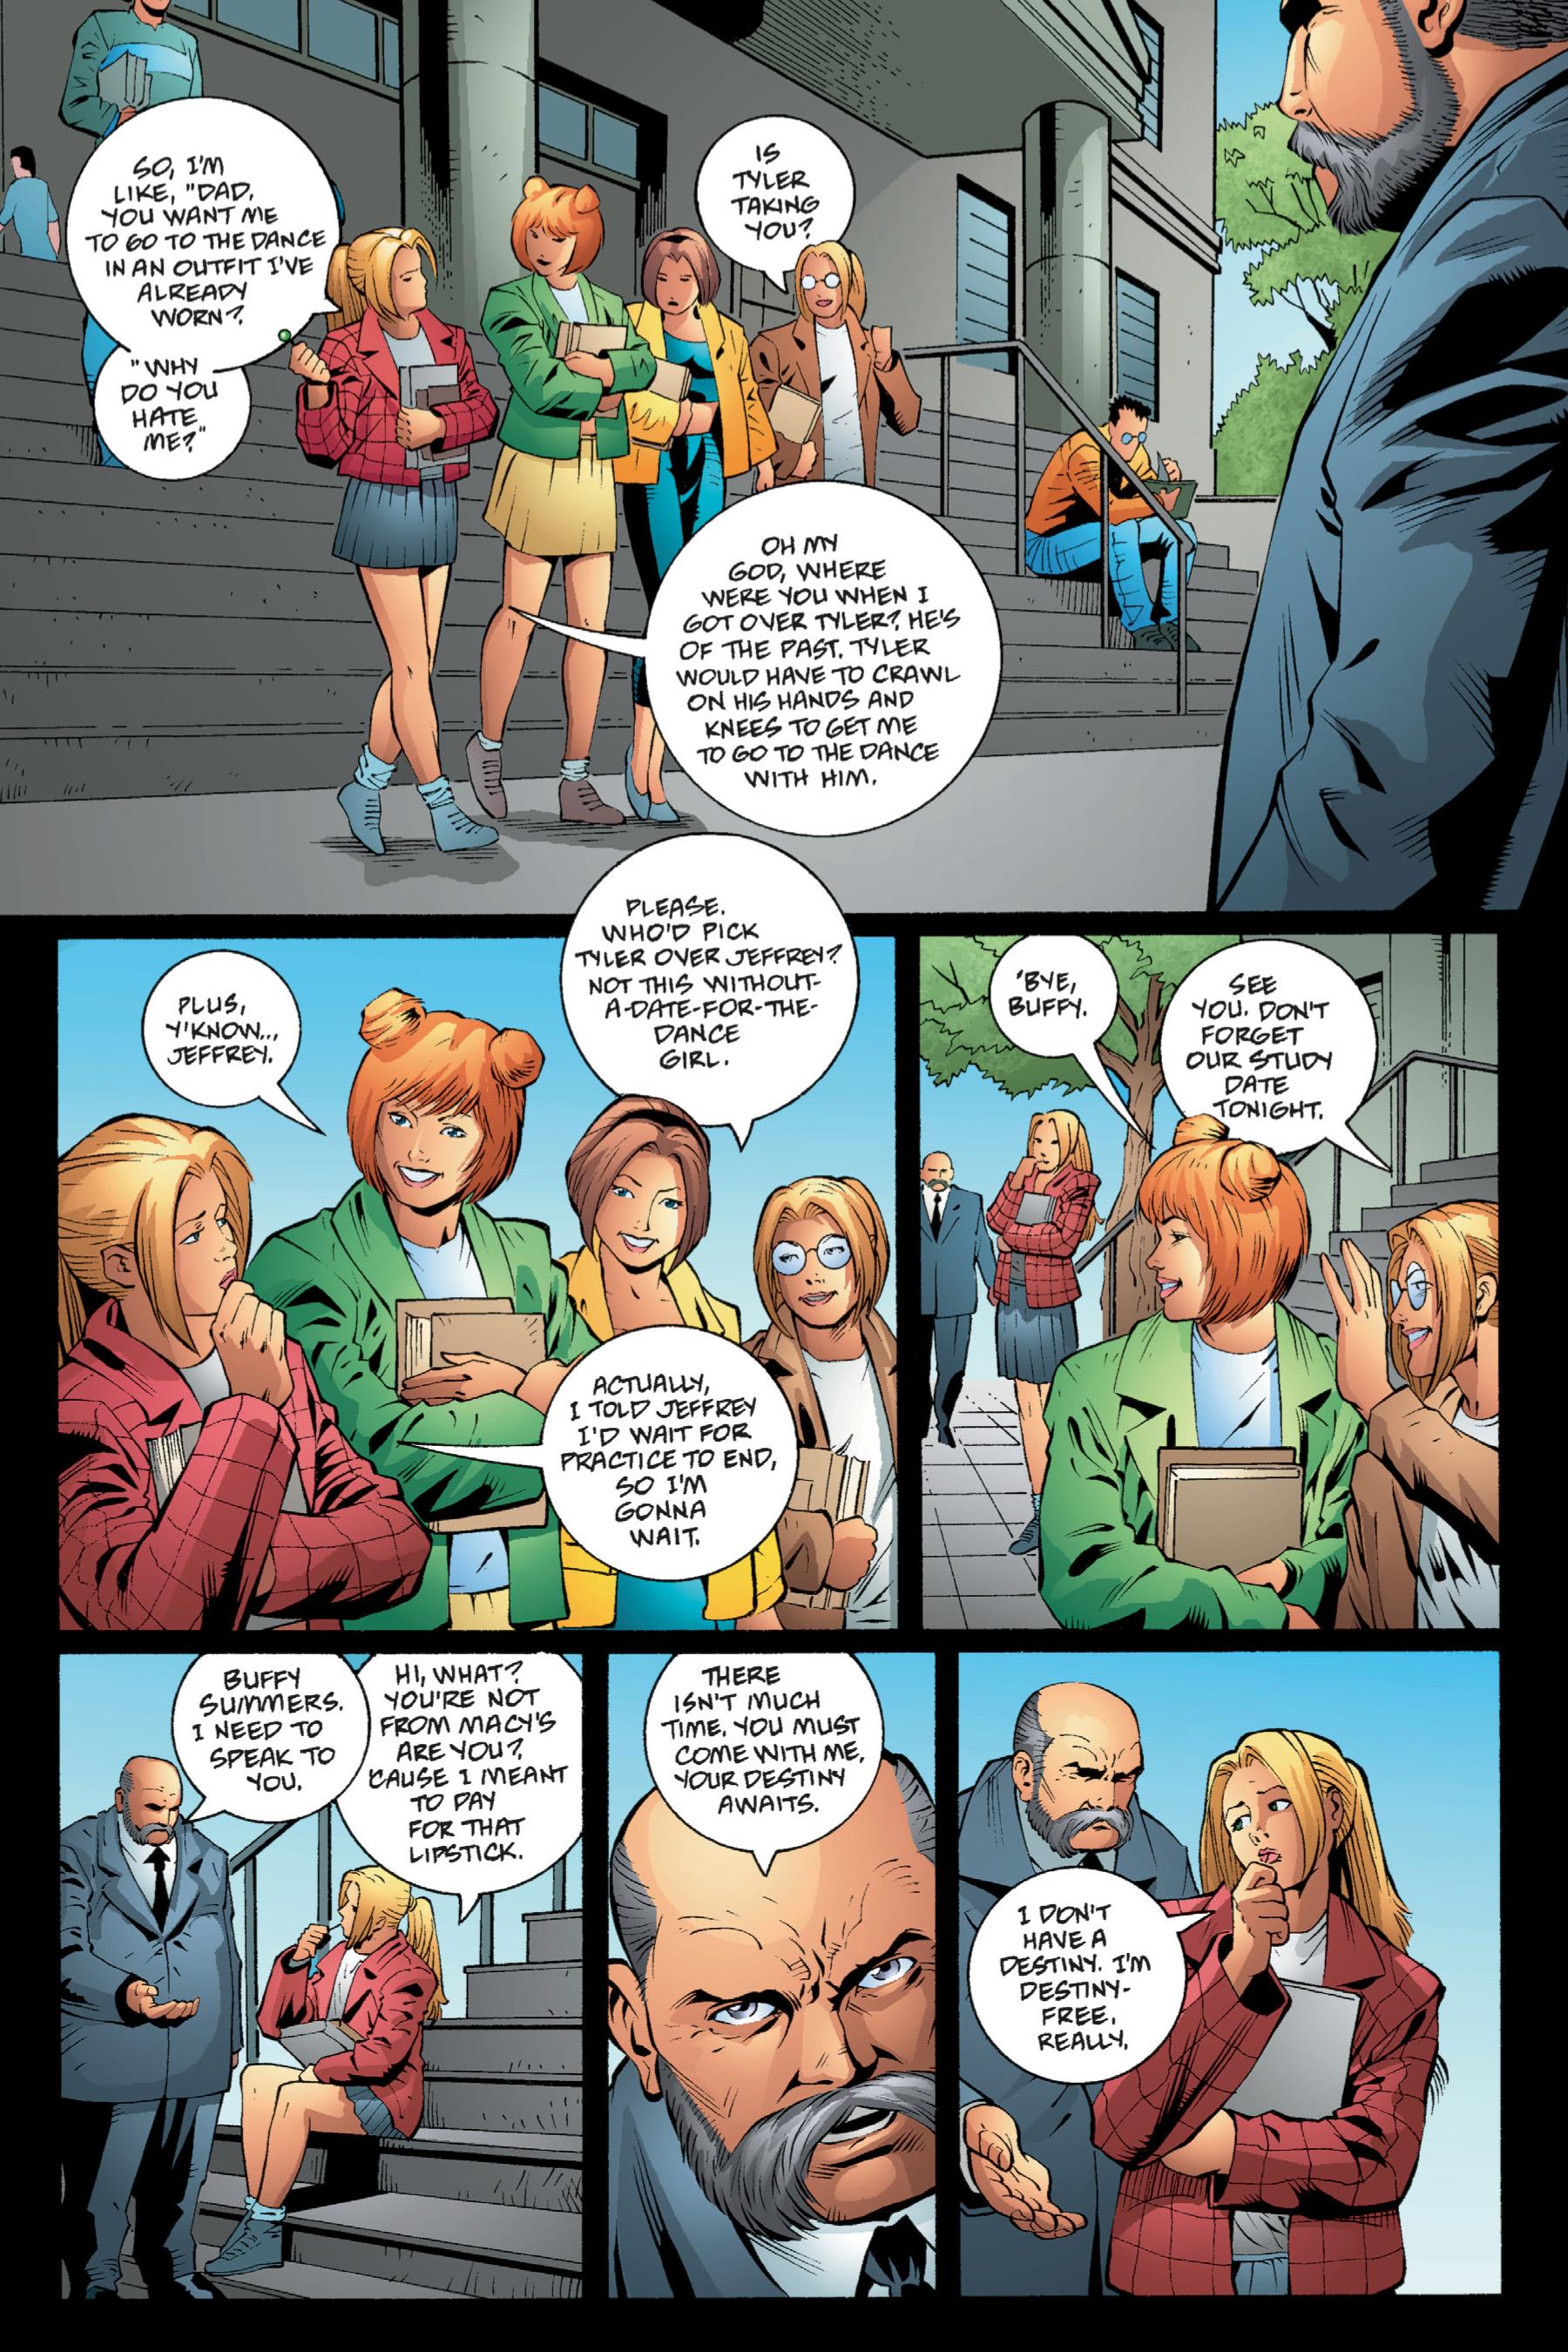 Read online Buffy the Vampire Slayer: Omnibus comic -  Issue # TPB 1 - 51